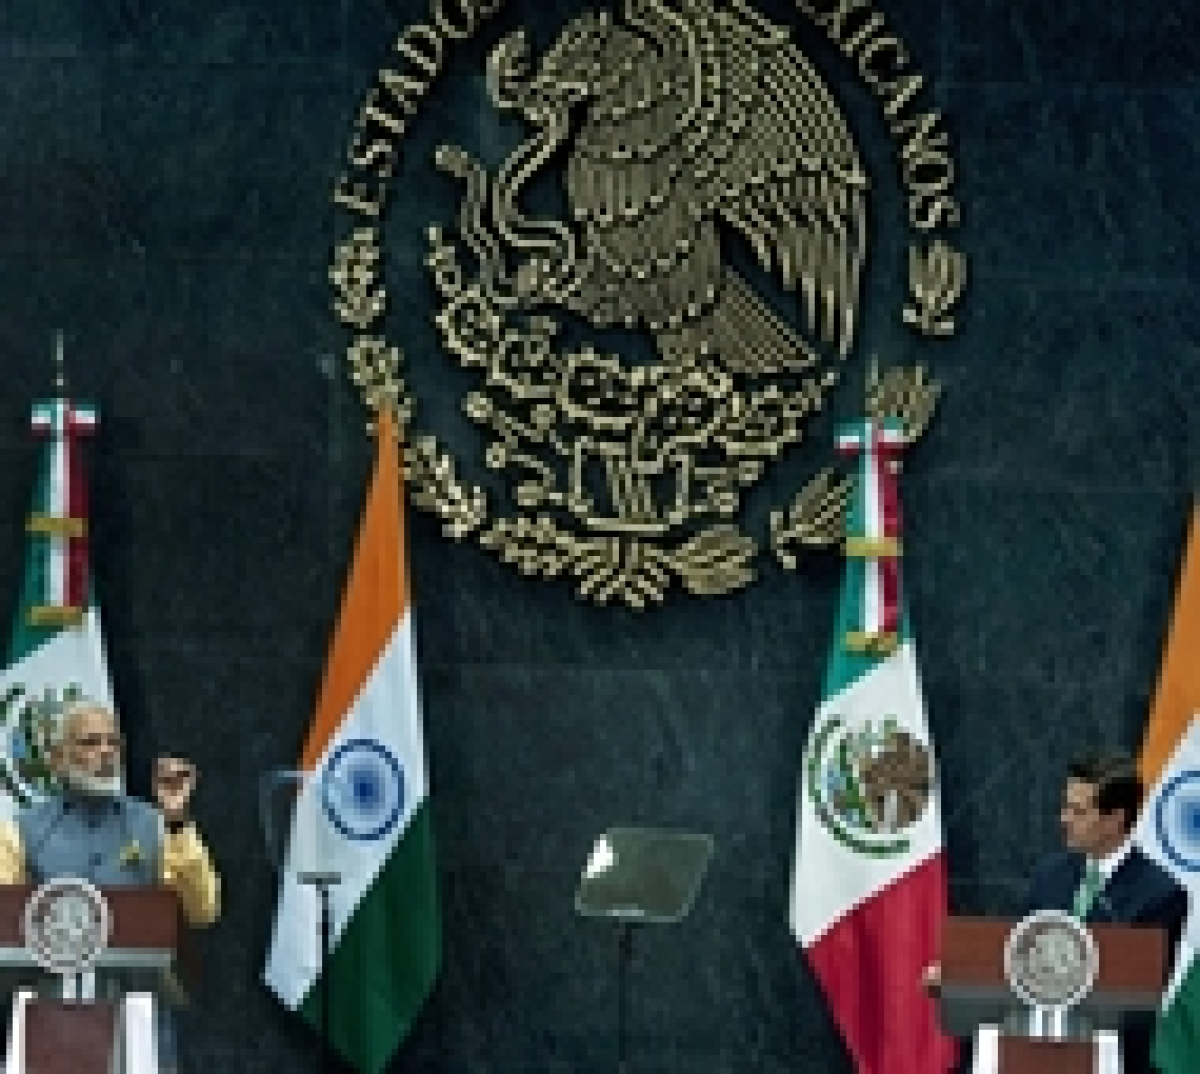 Mexico backs India's NSG membership bid after Swiss support